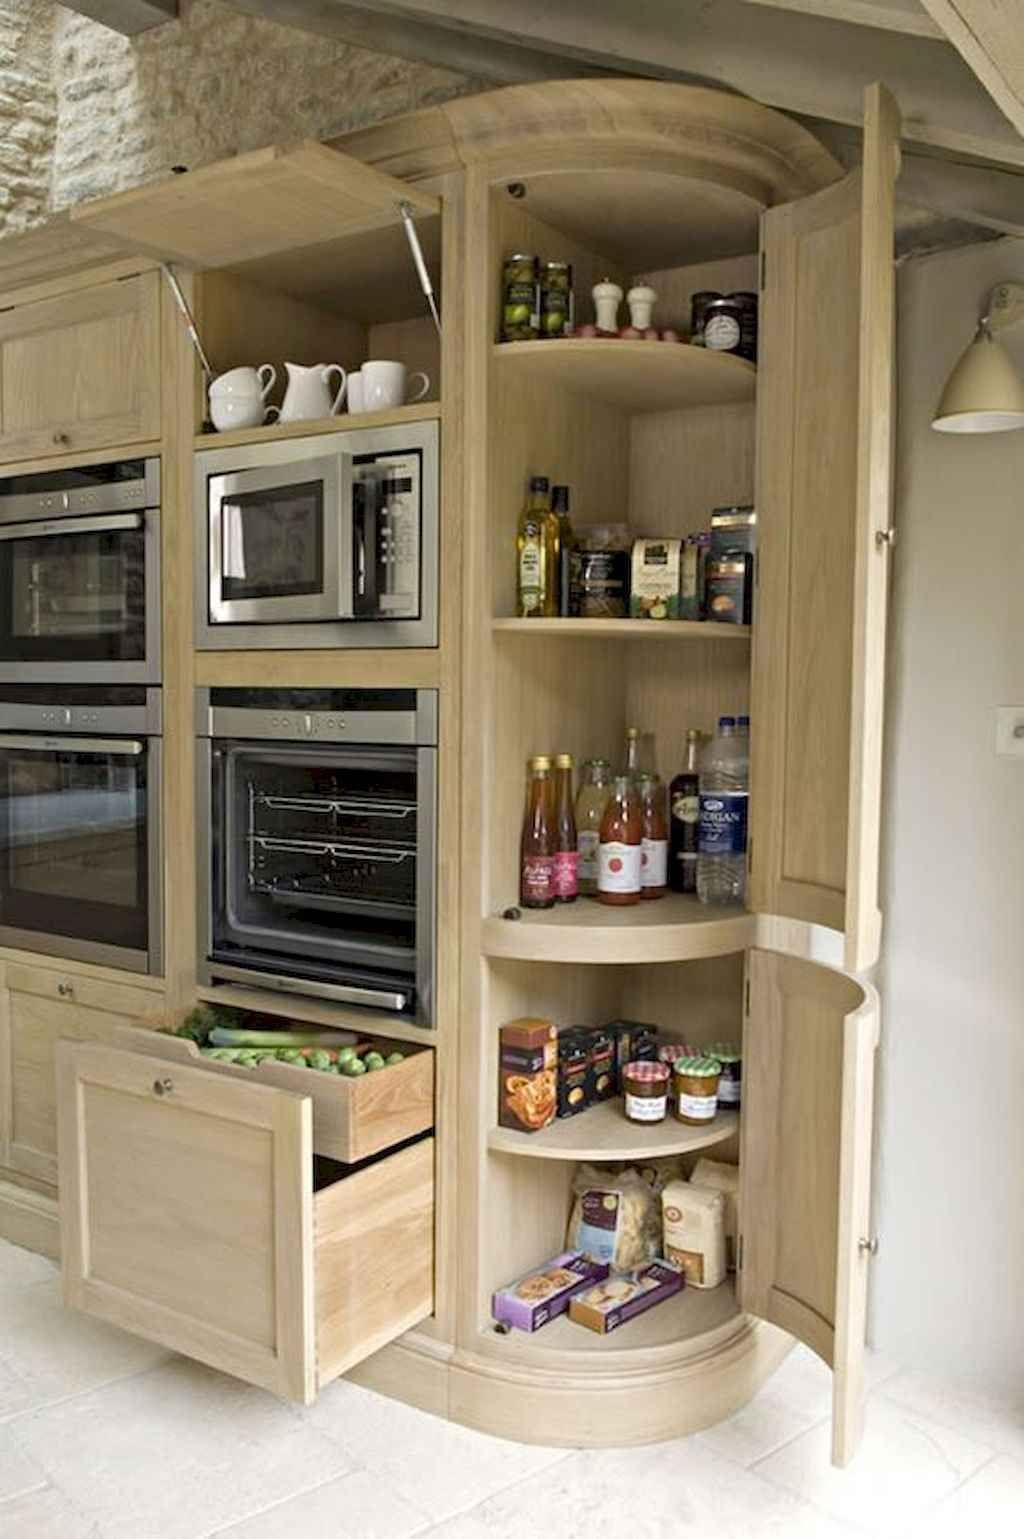 01 brilliant kitchen cabinet organization and tips ideas on brilliant kitchen cabinet organization id=65265